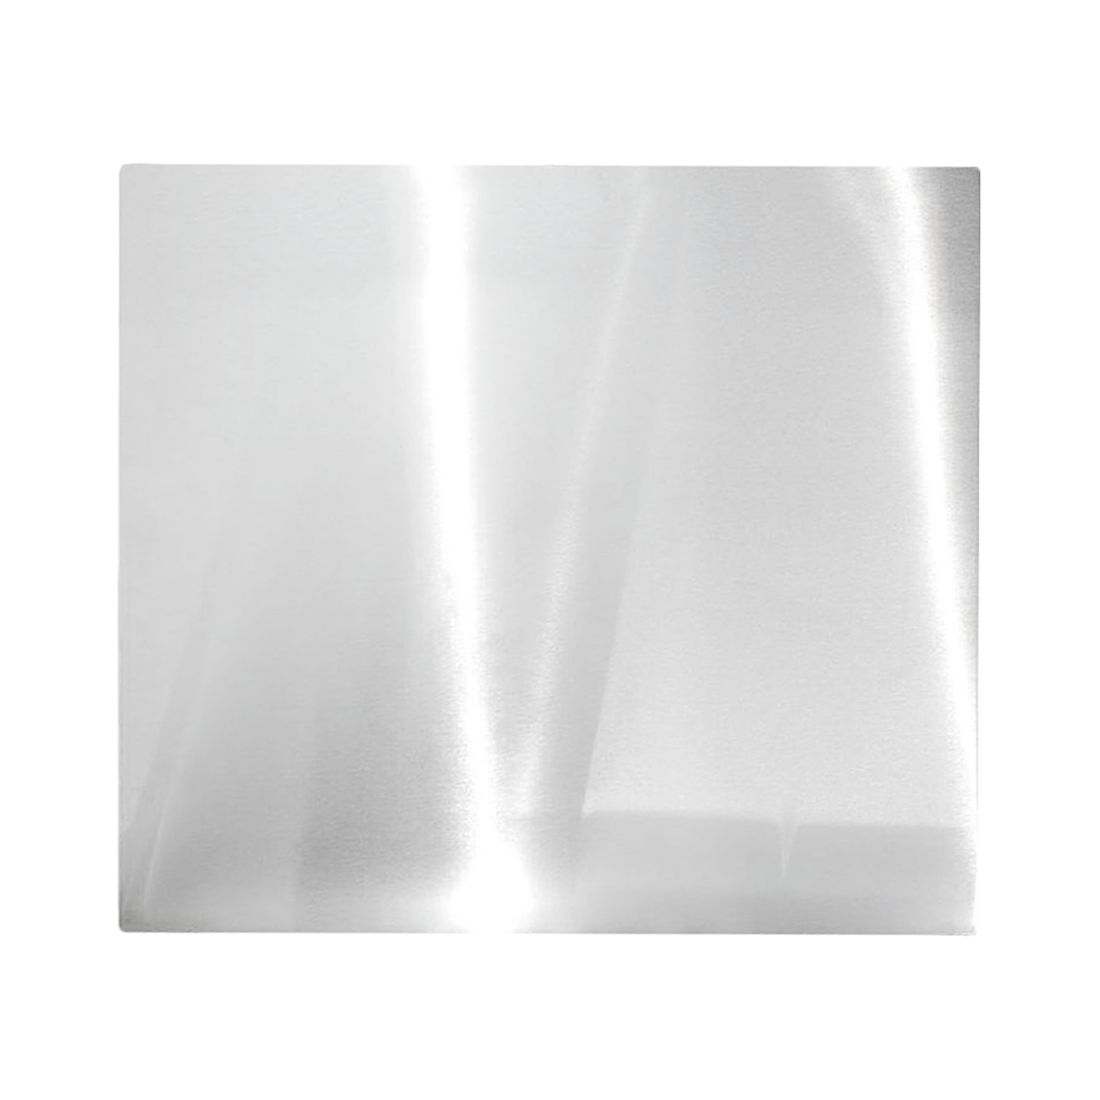 Wandblende/Spritzschutz – Edelstahl, WENKO online bestellen